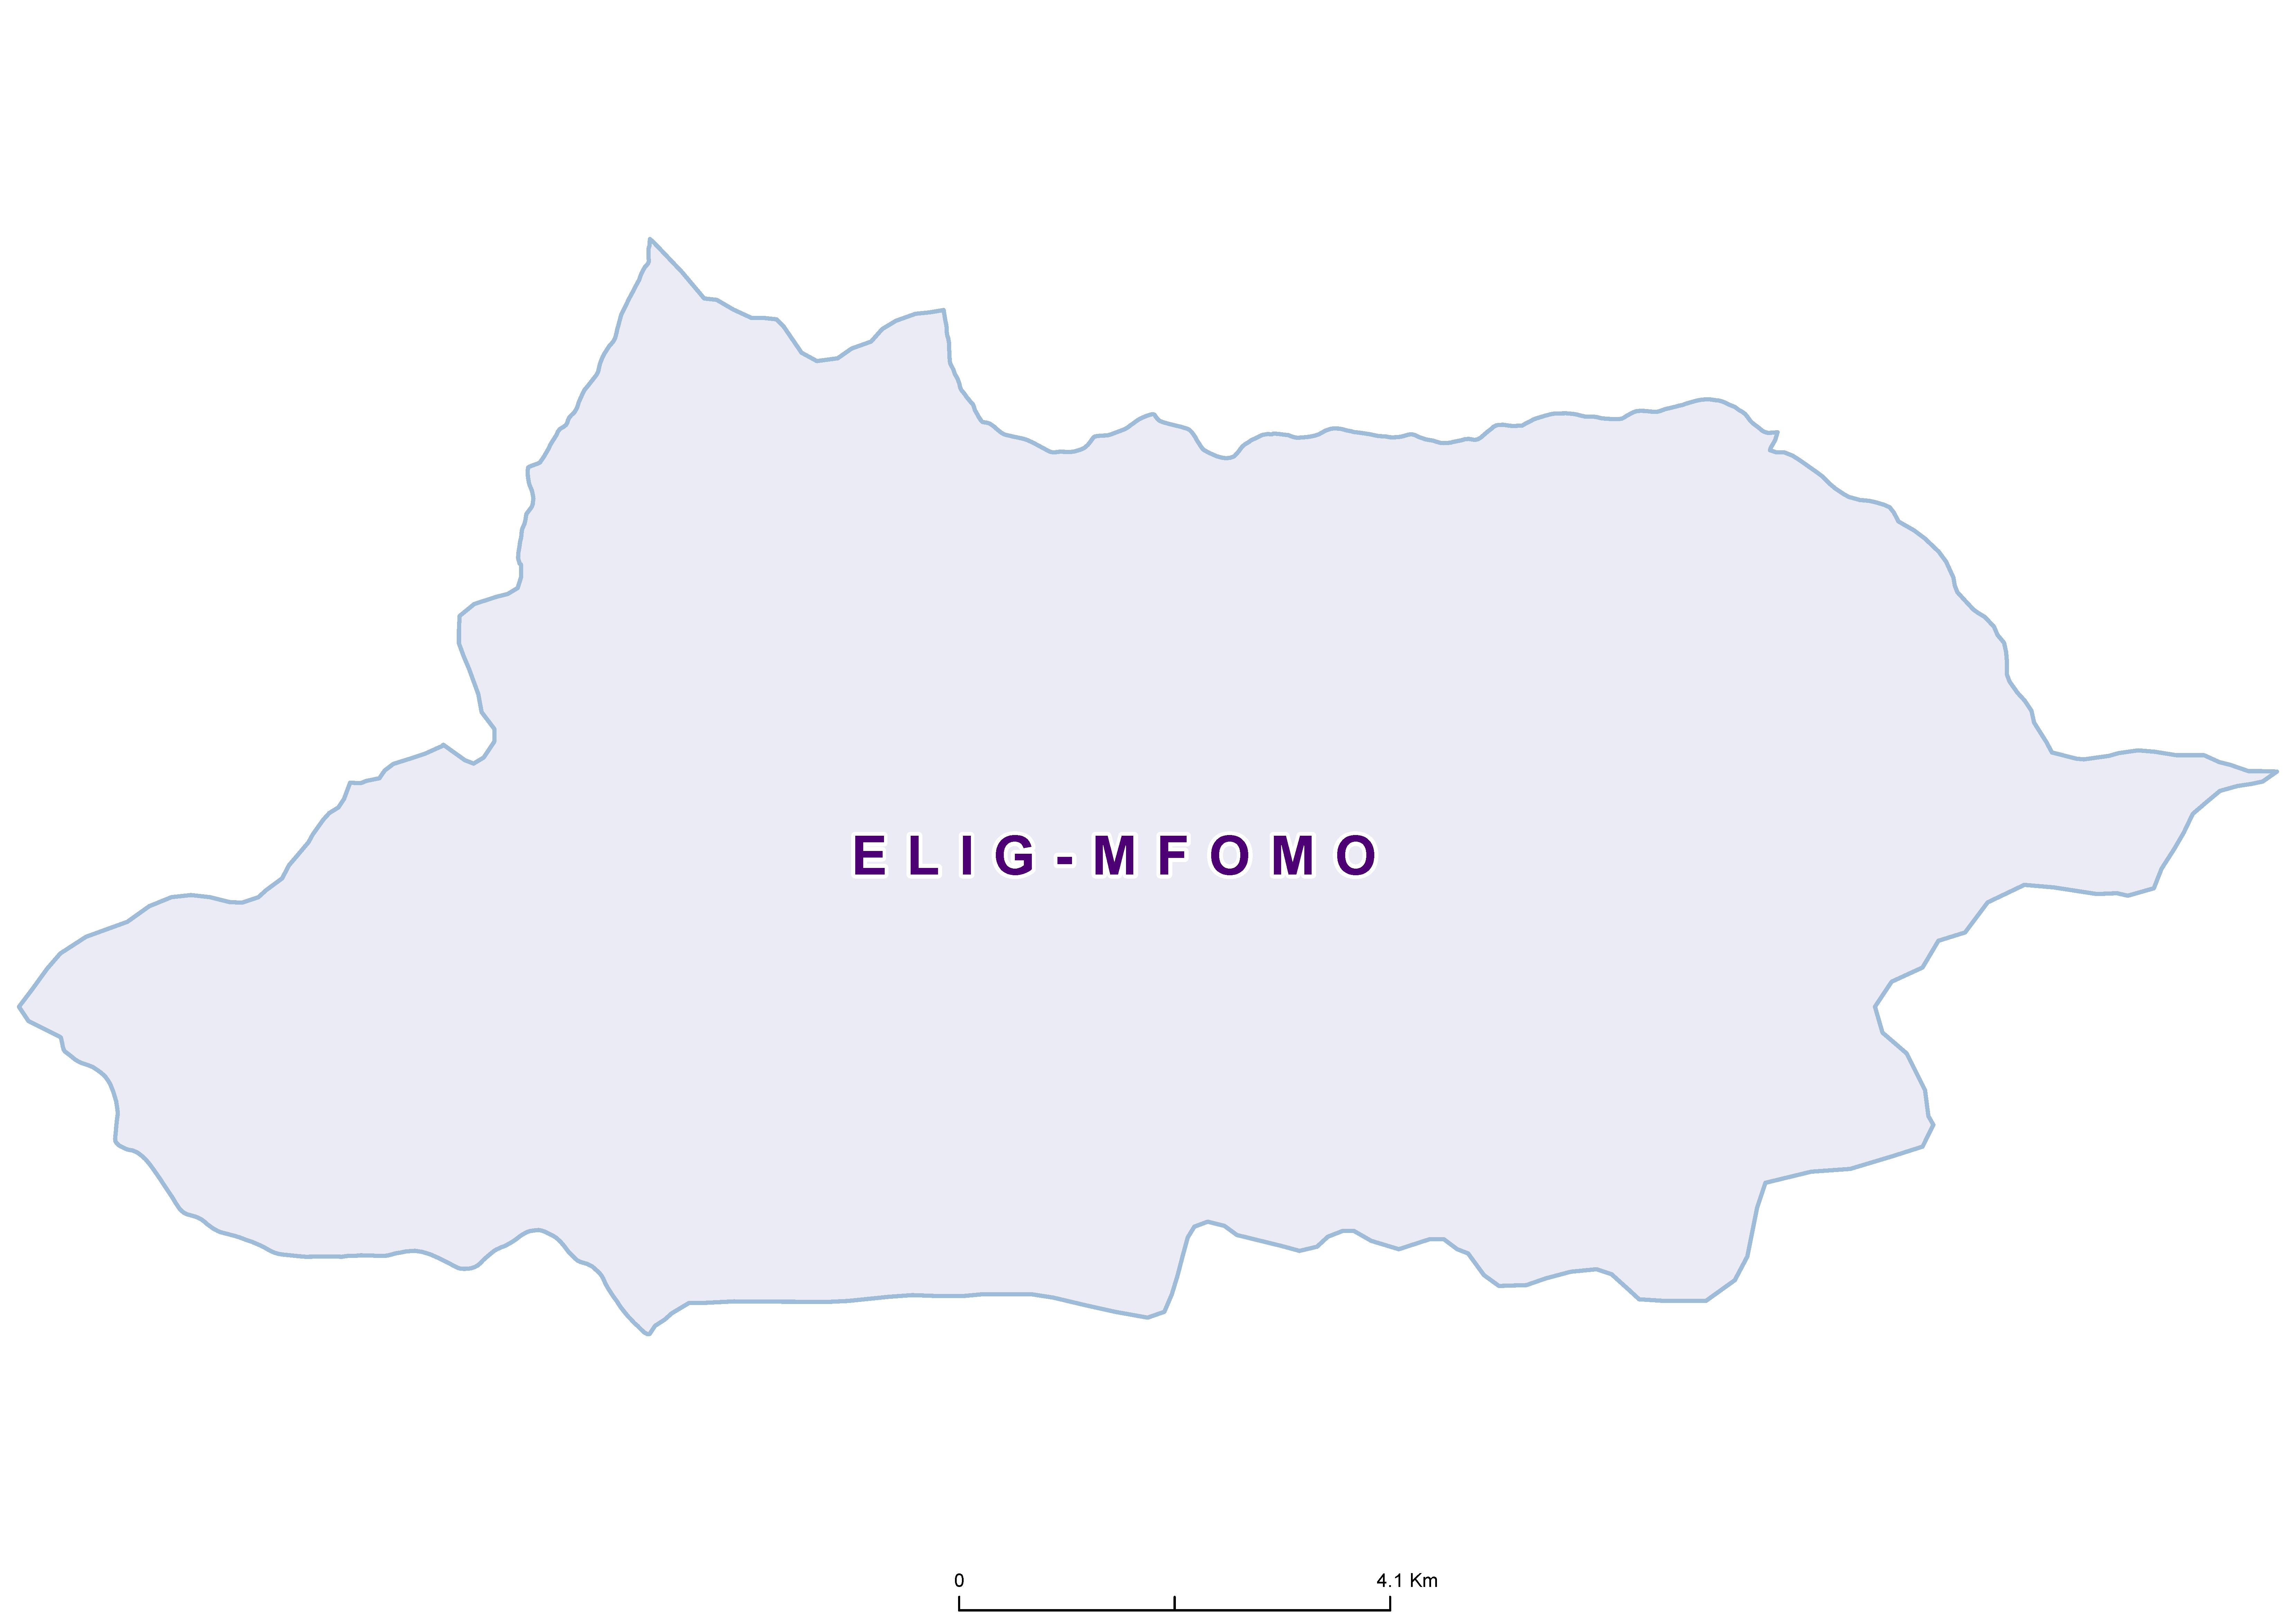 Elig-mfomo Mean STH 20180001